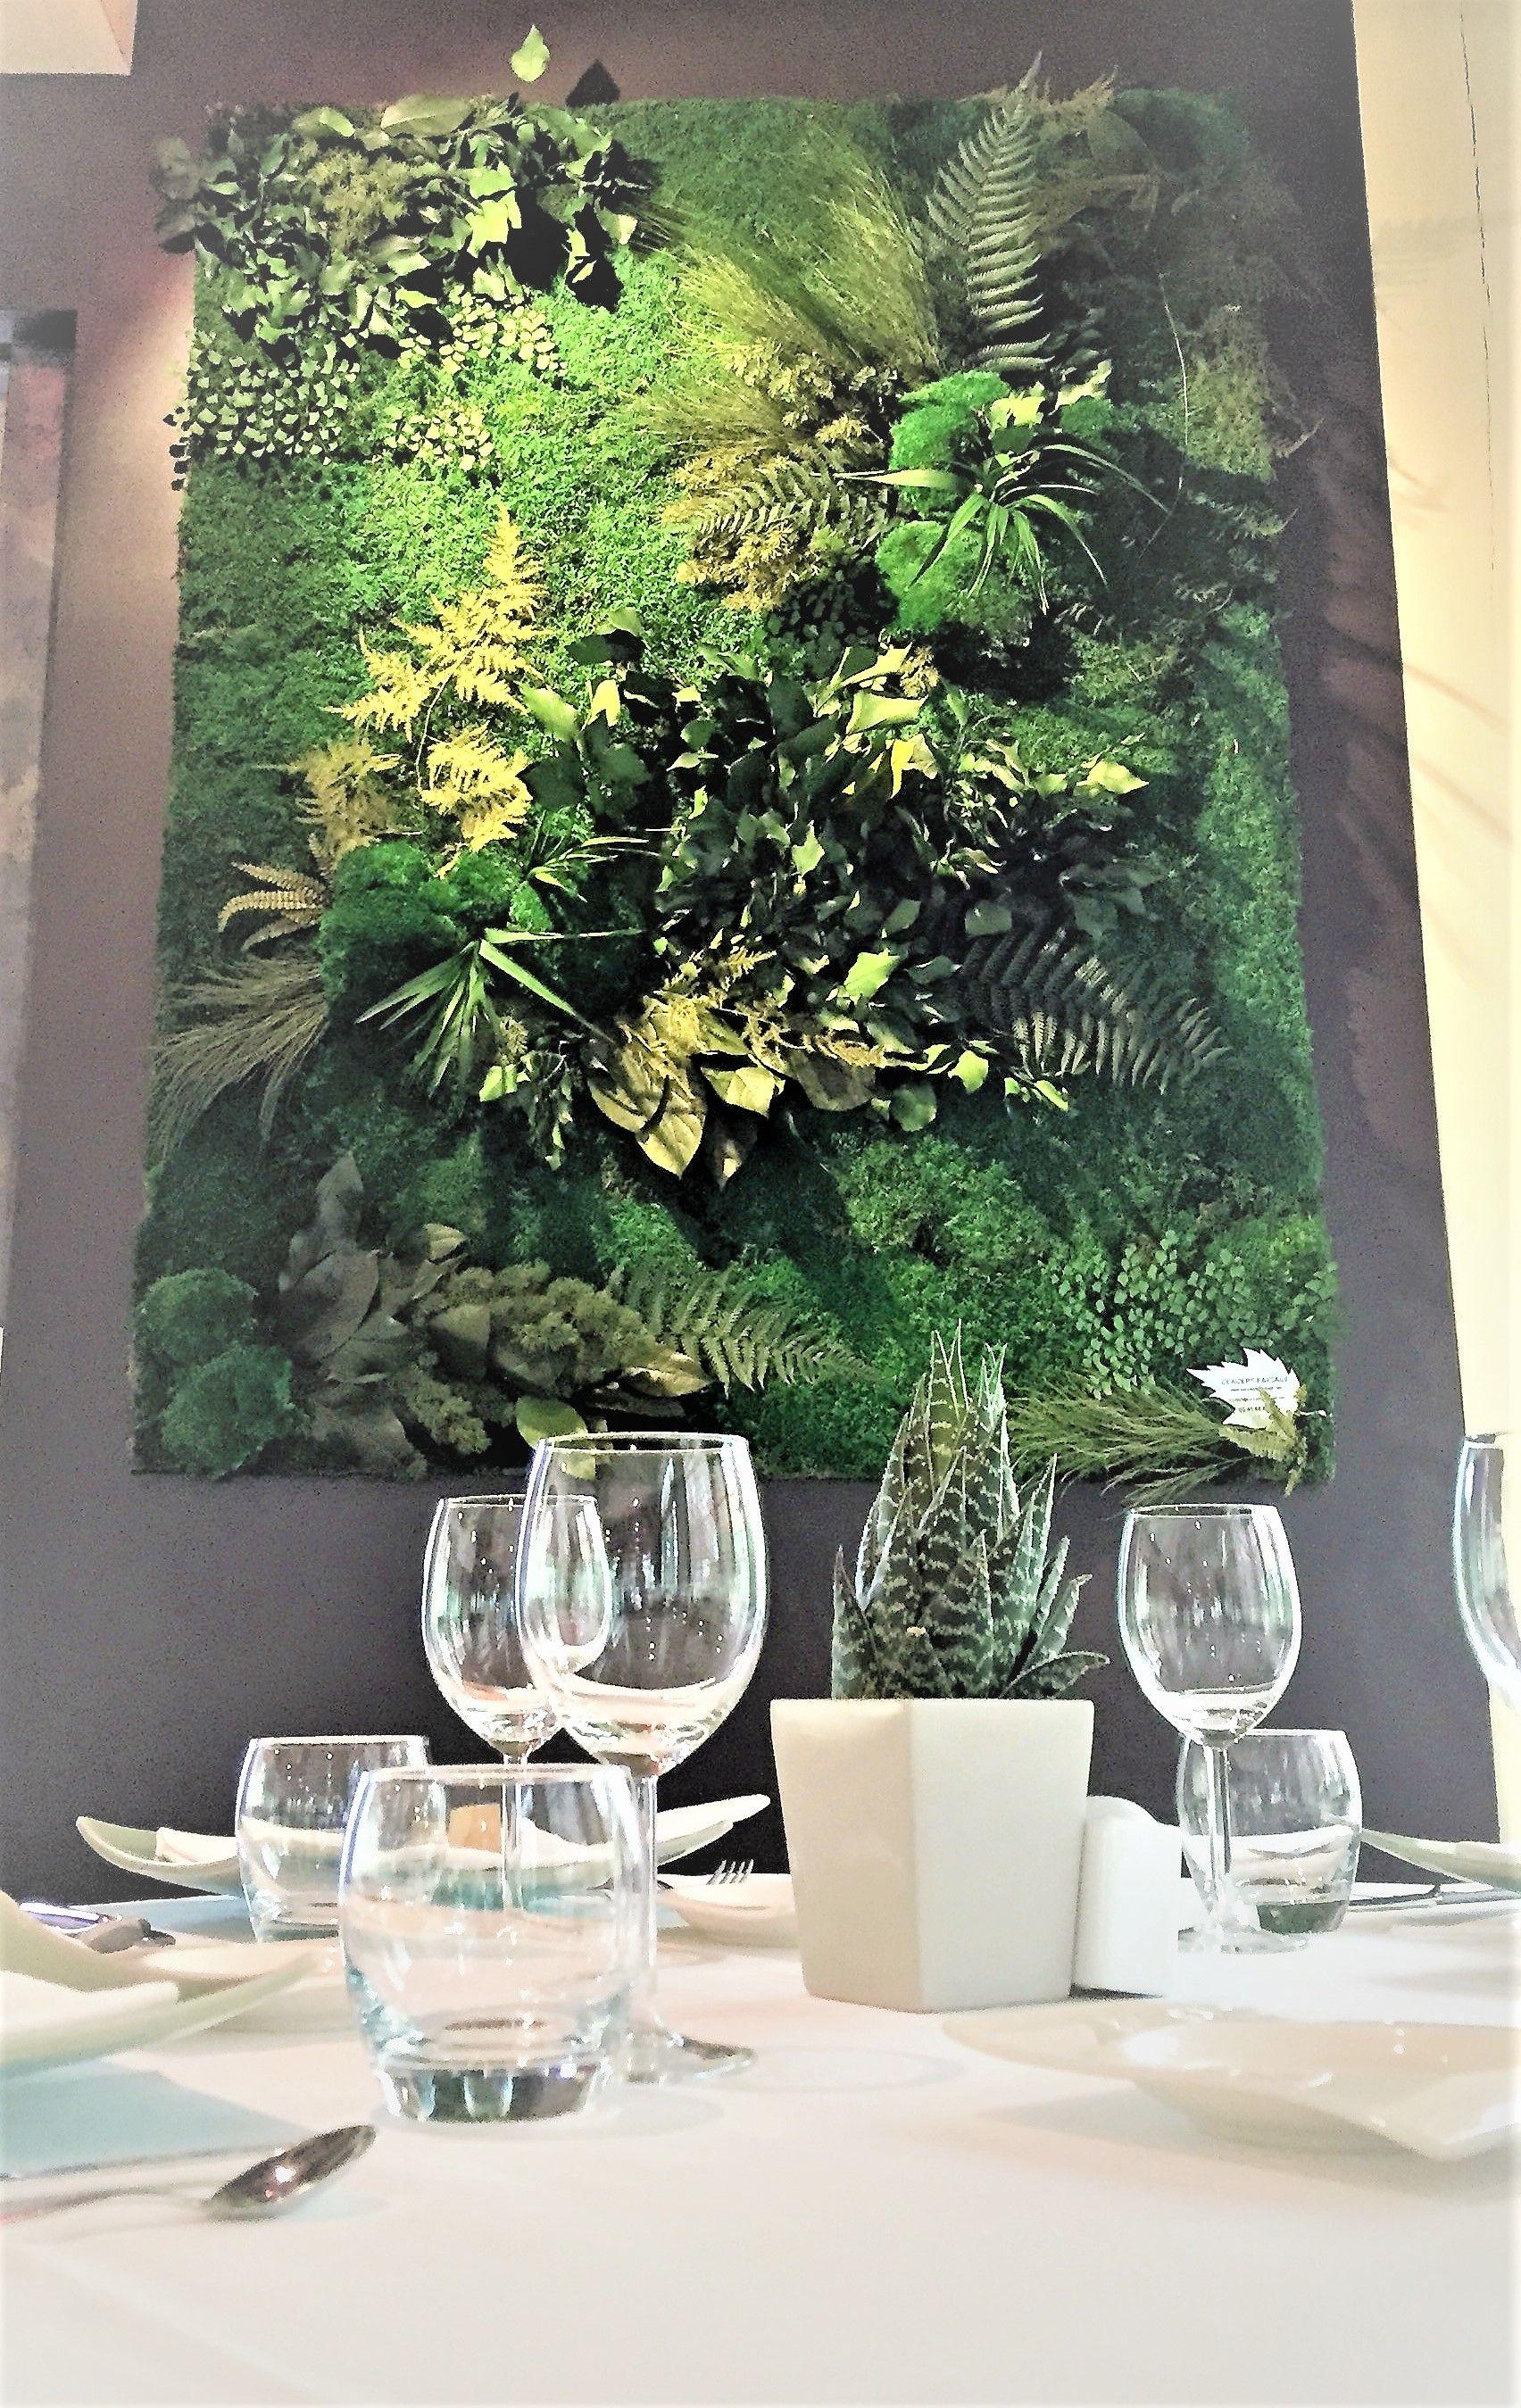 mur v g tal stabilis restaurant gastronomique l 39 hoirie. Black Bedroom Furniture Sets. Home Design Ideas